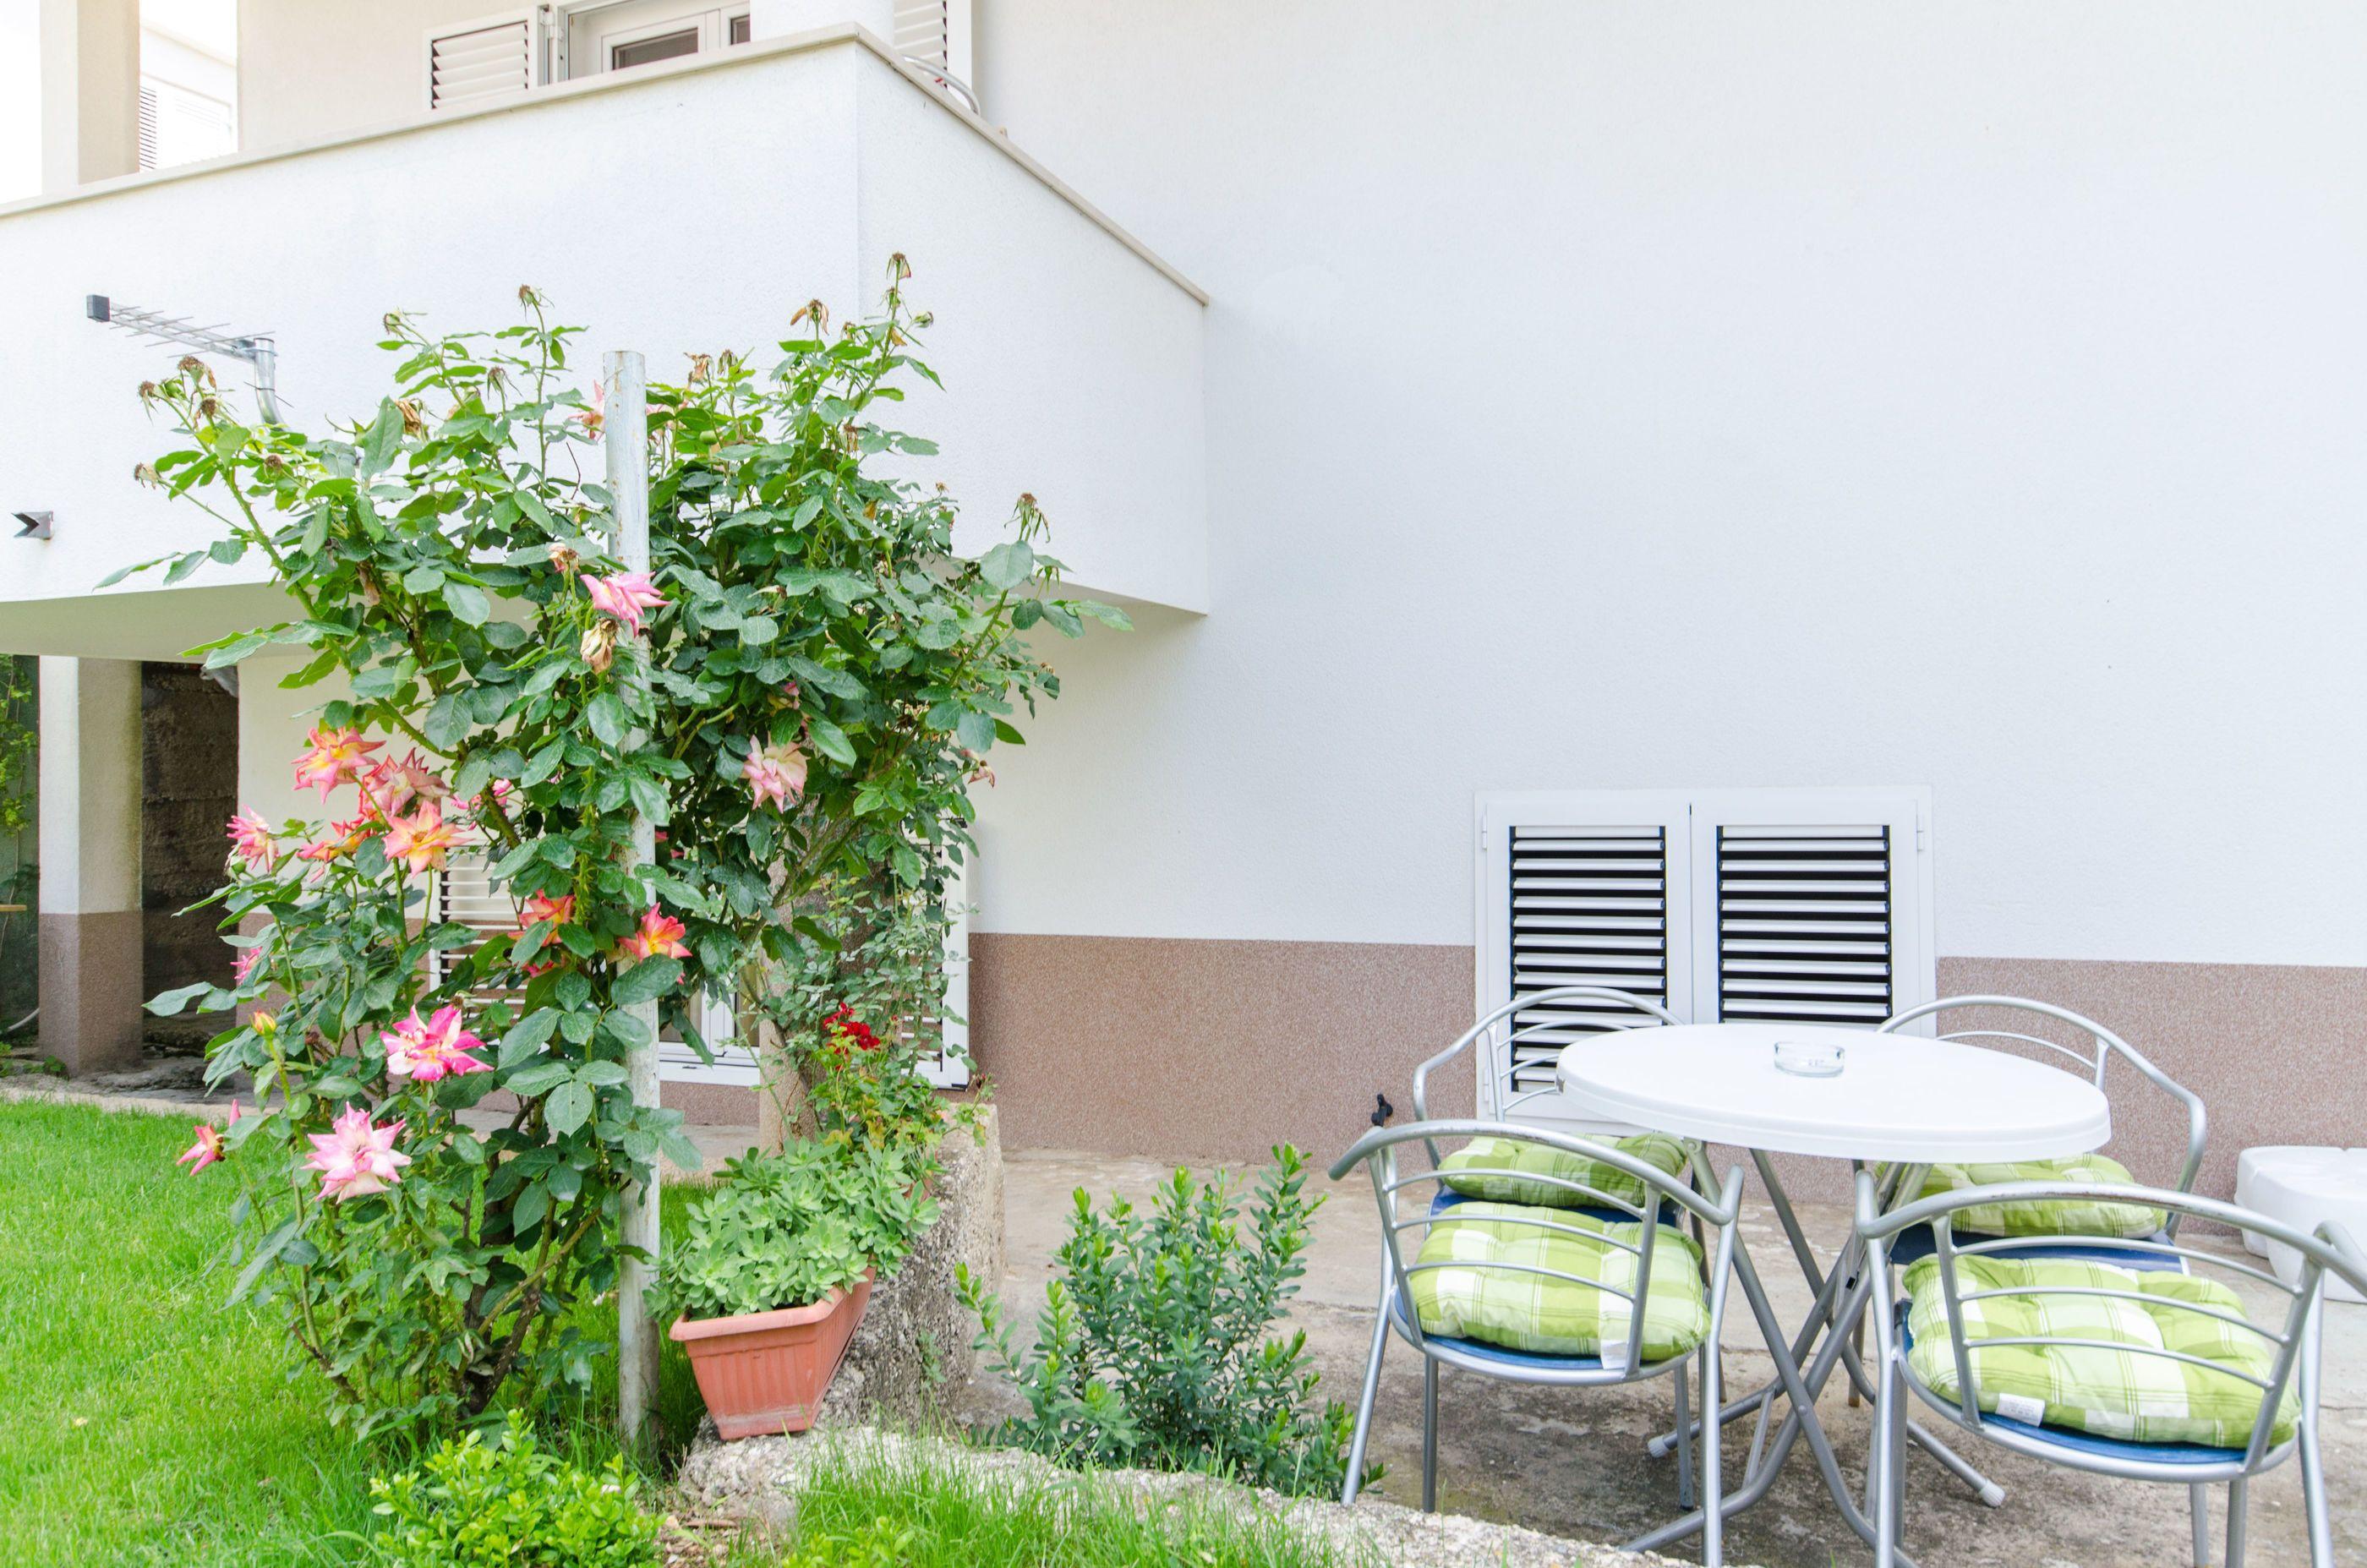 Apartments Mateo